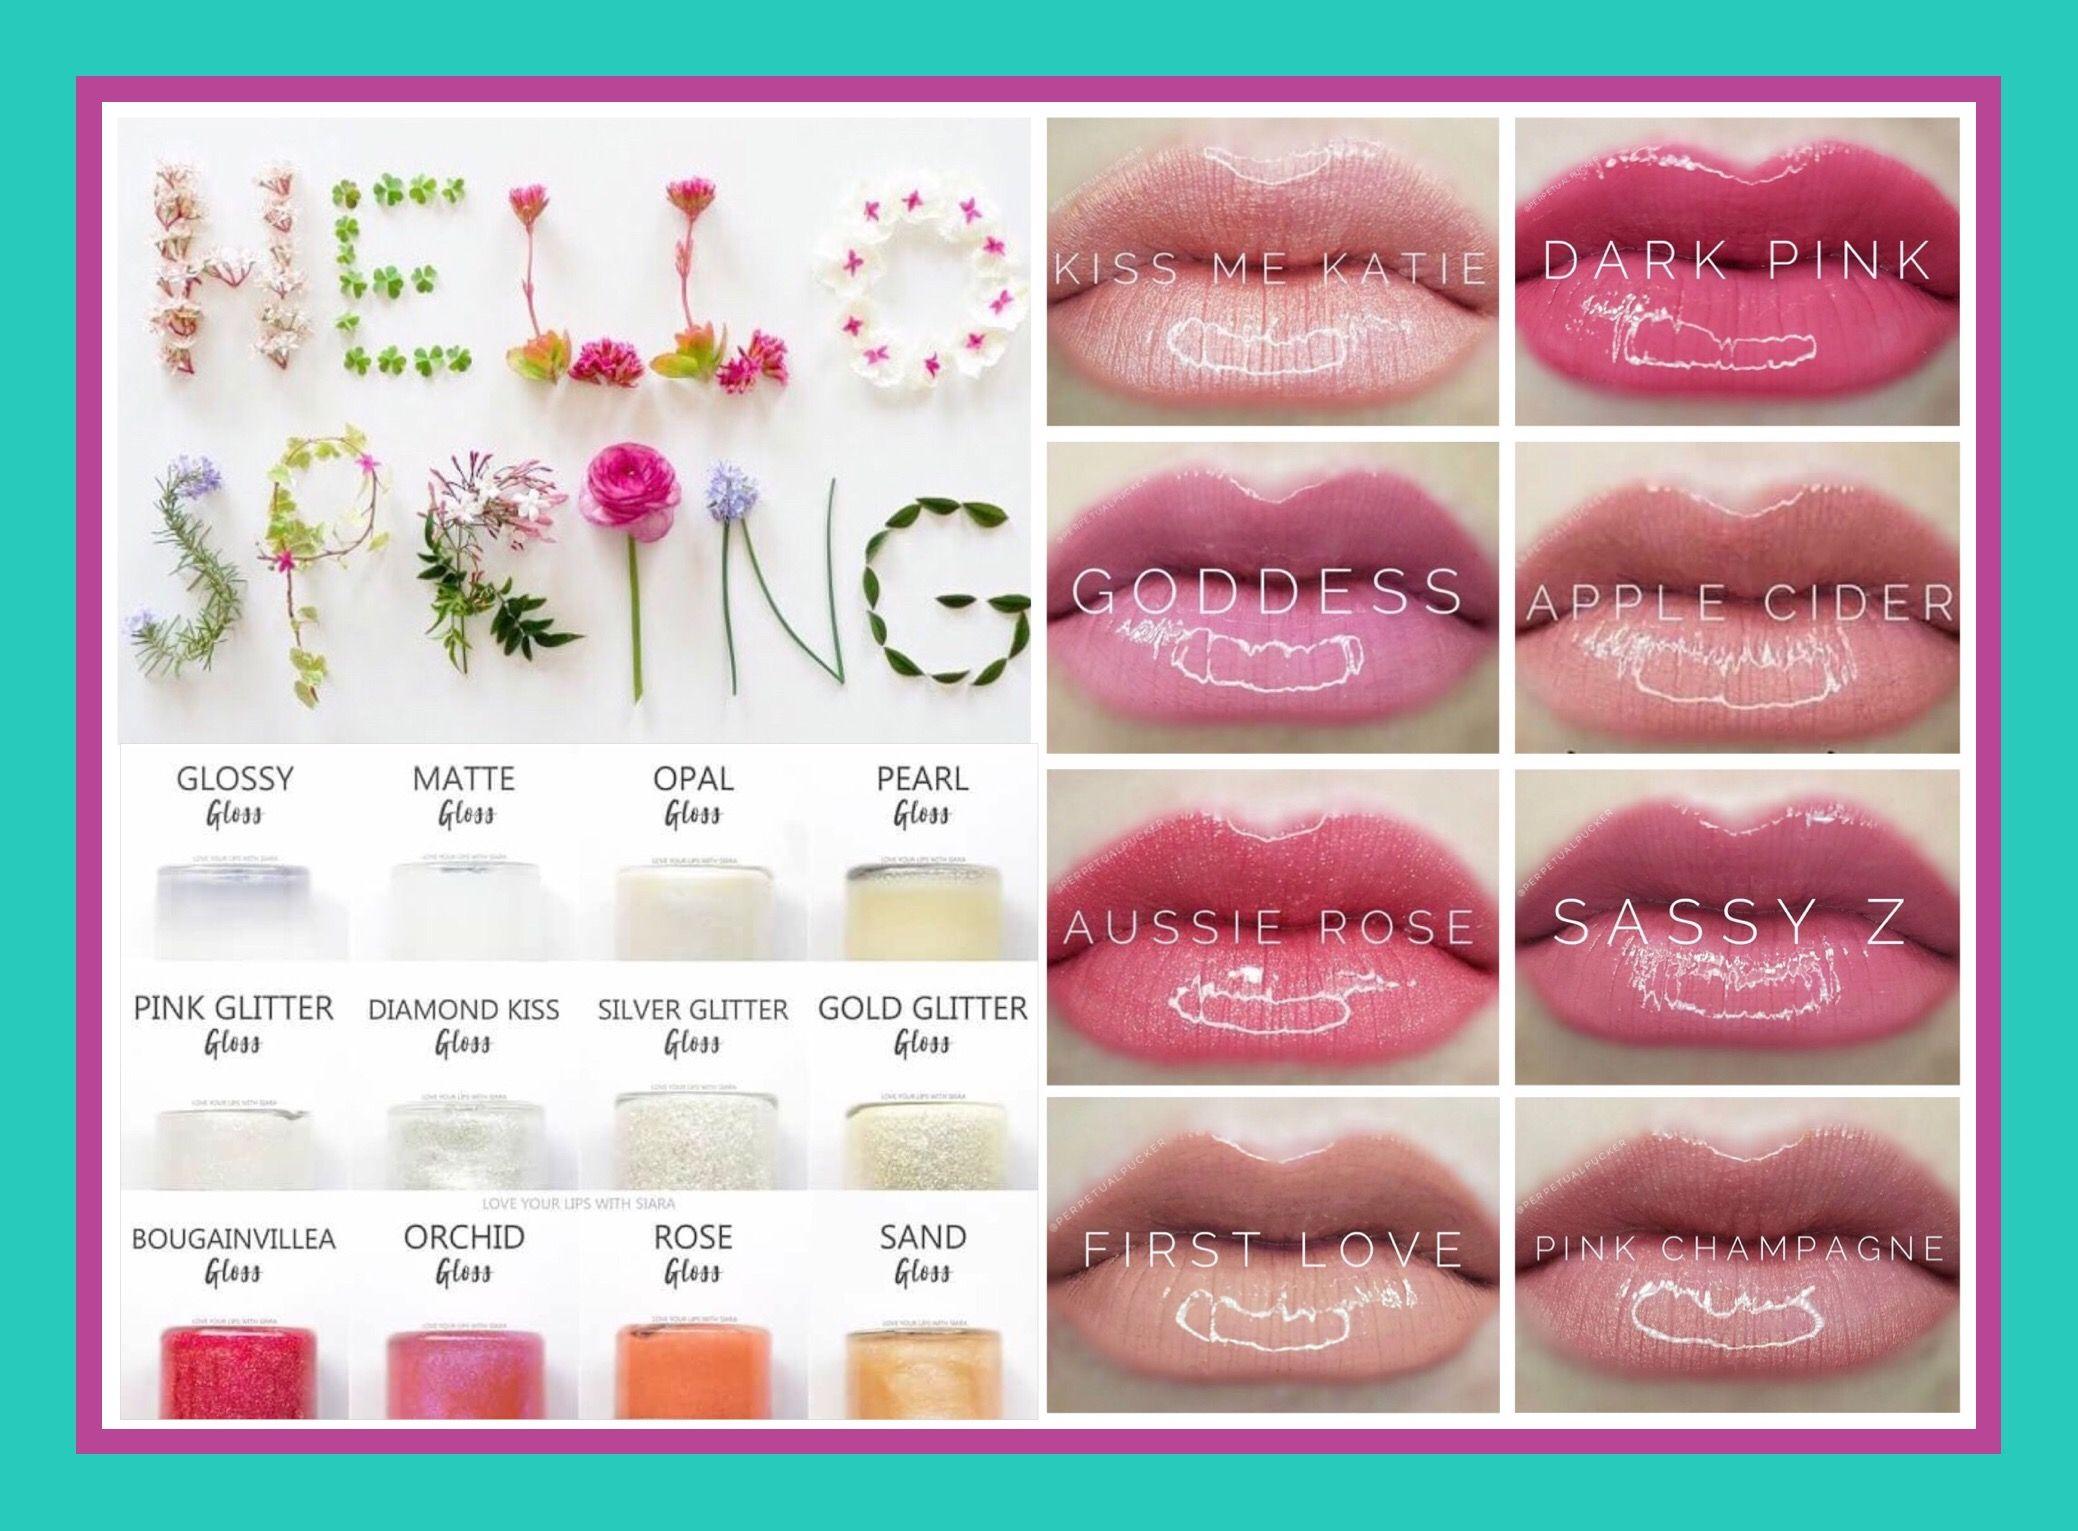 Spring Senegence lipsense, Lipsense, Lipsense colors